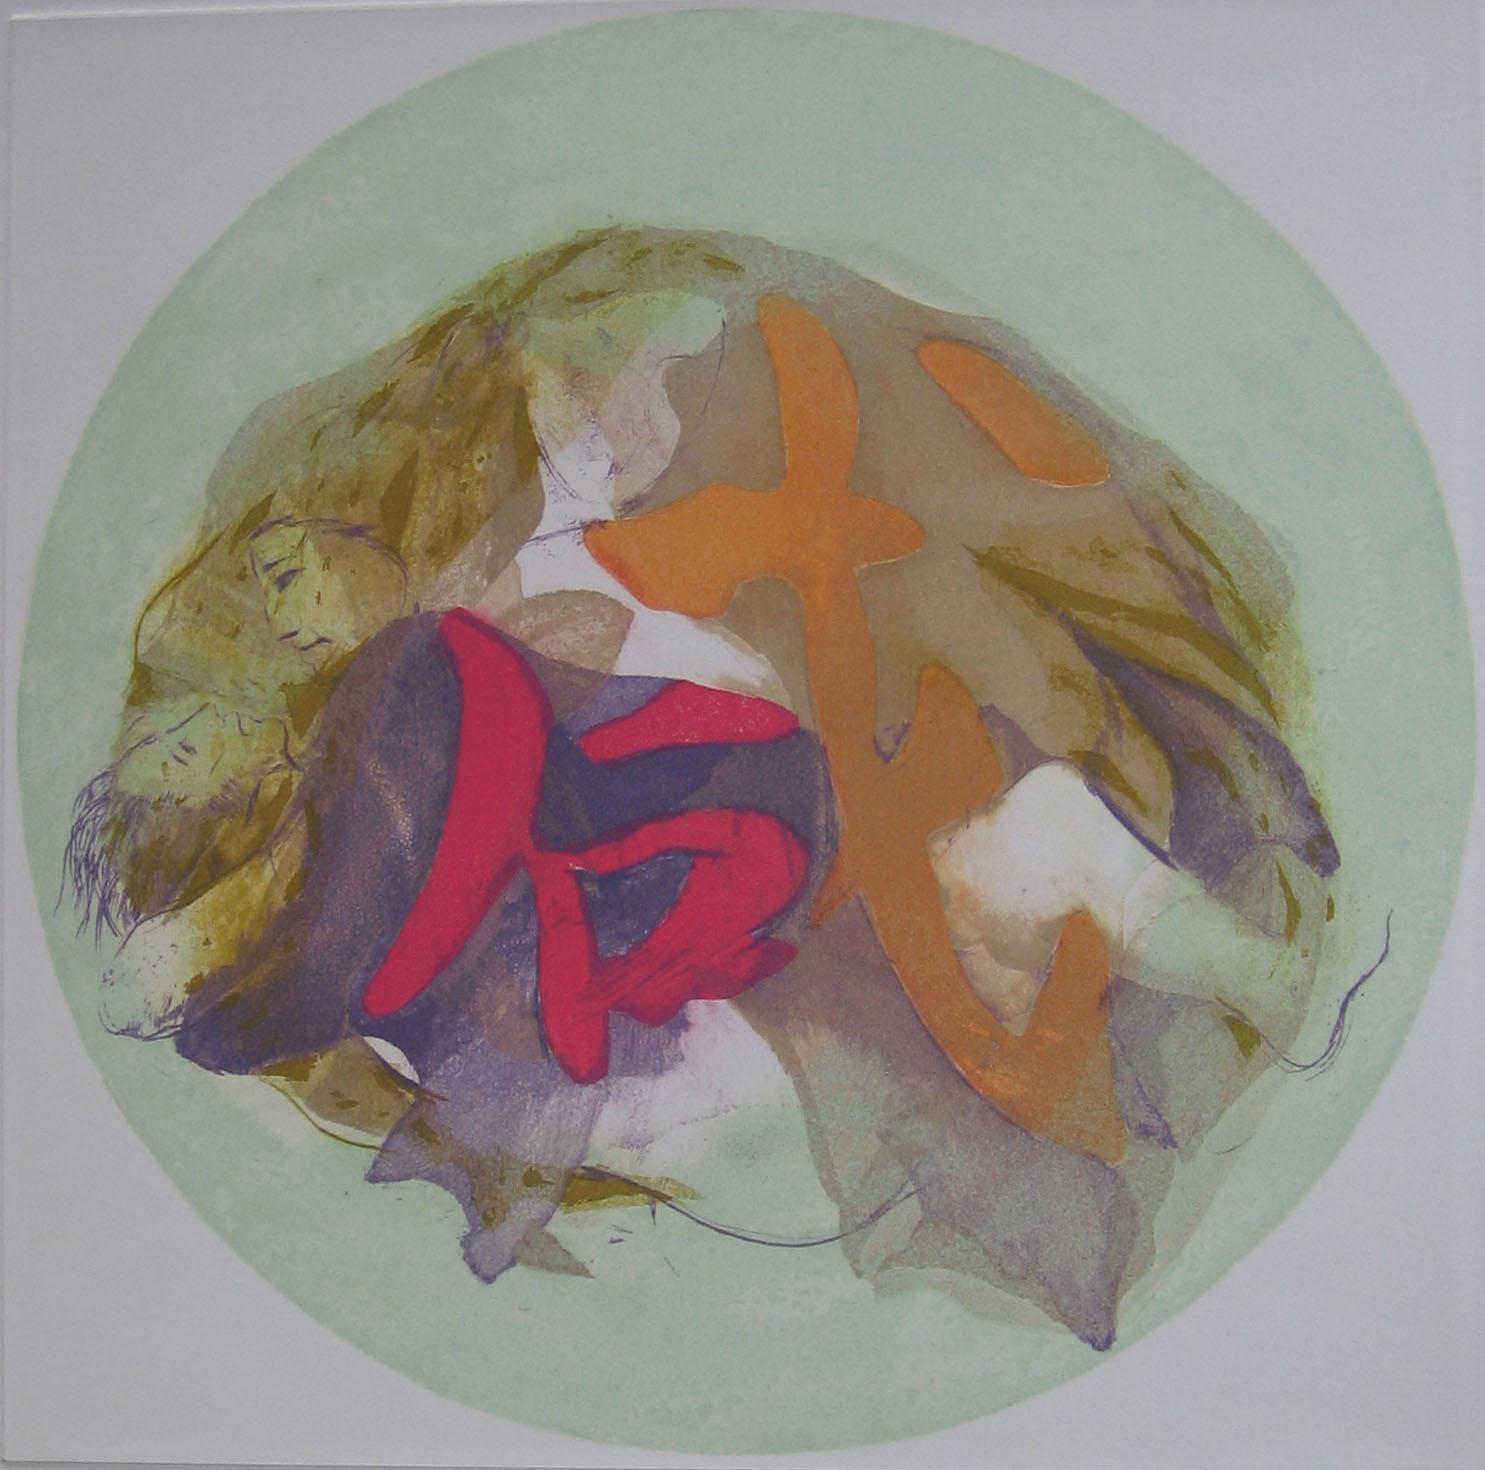 Risultati immagini per iching circle